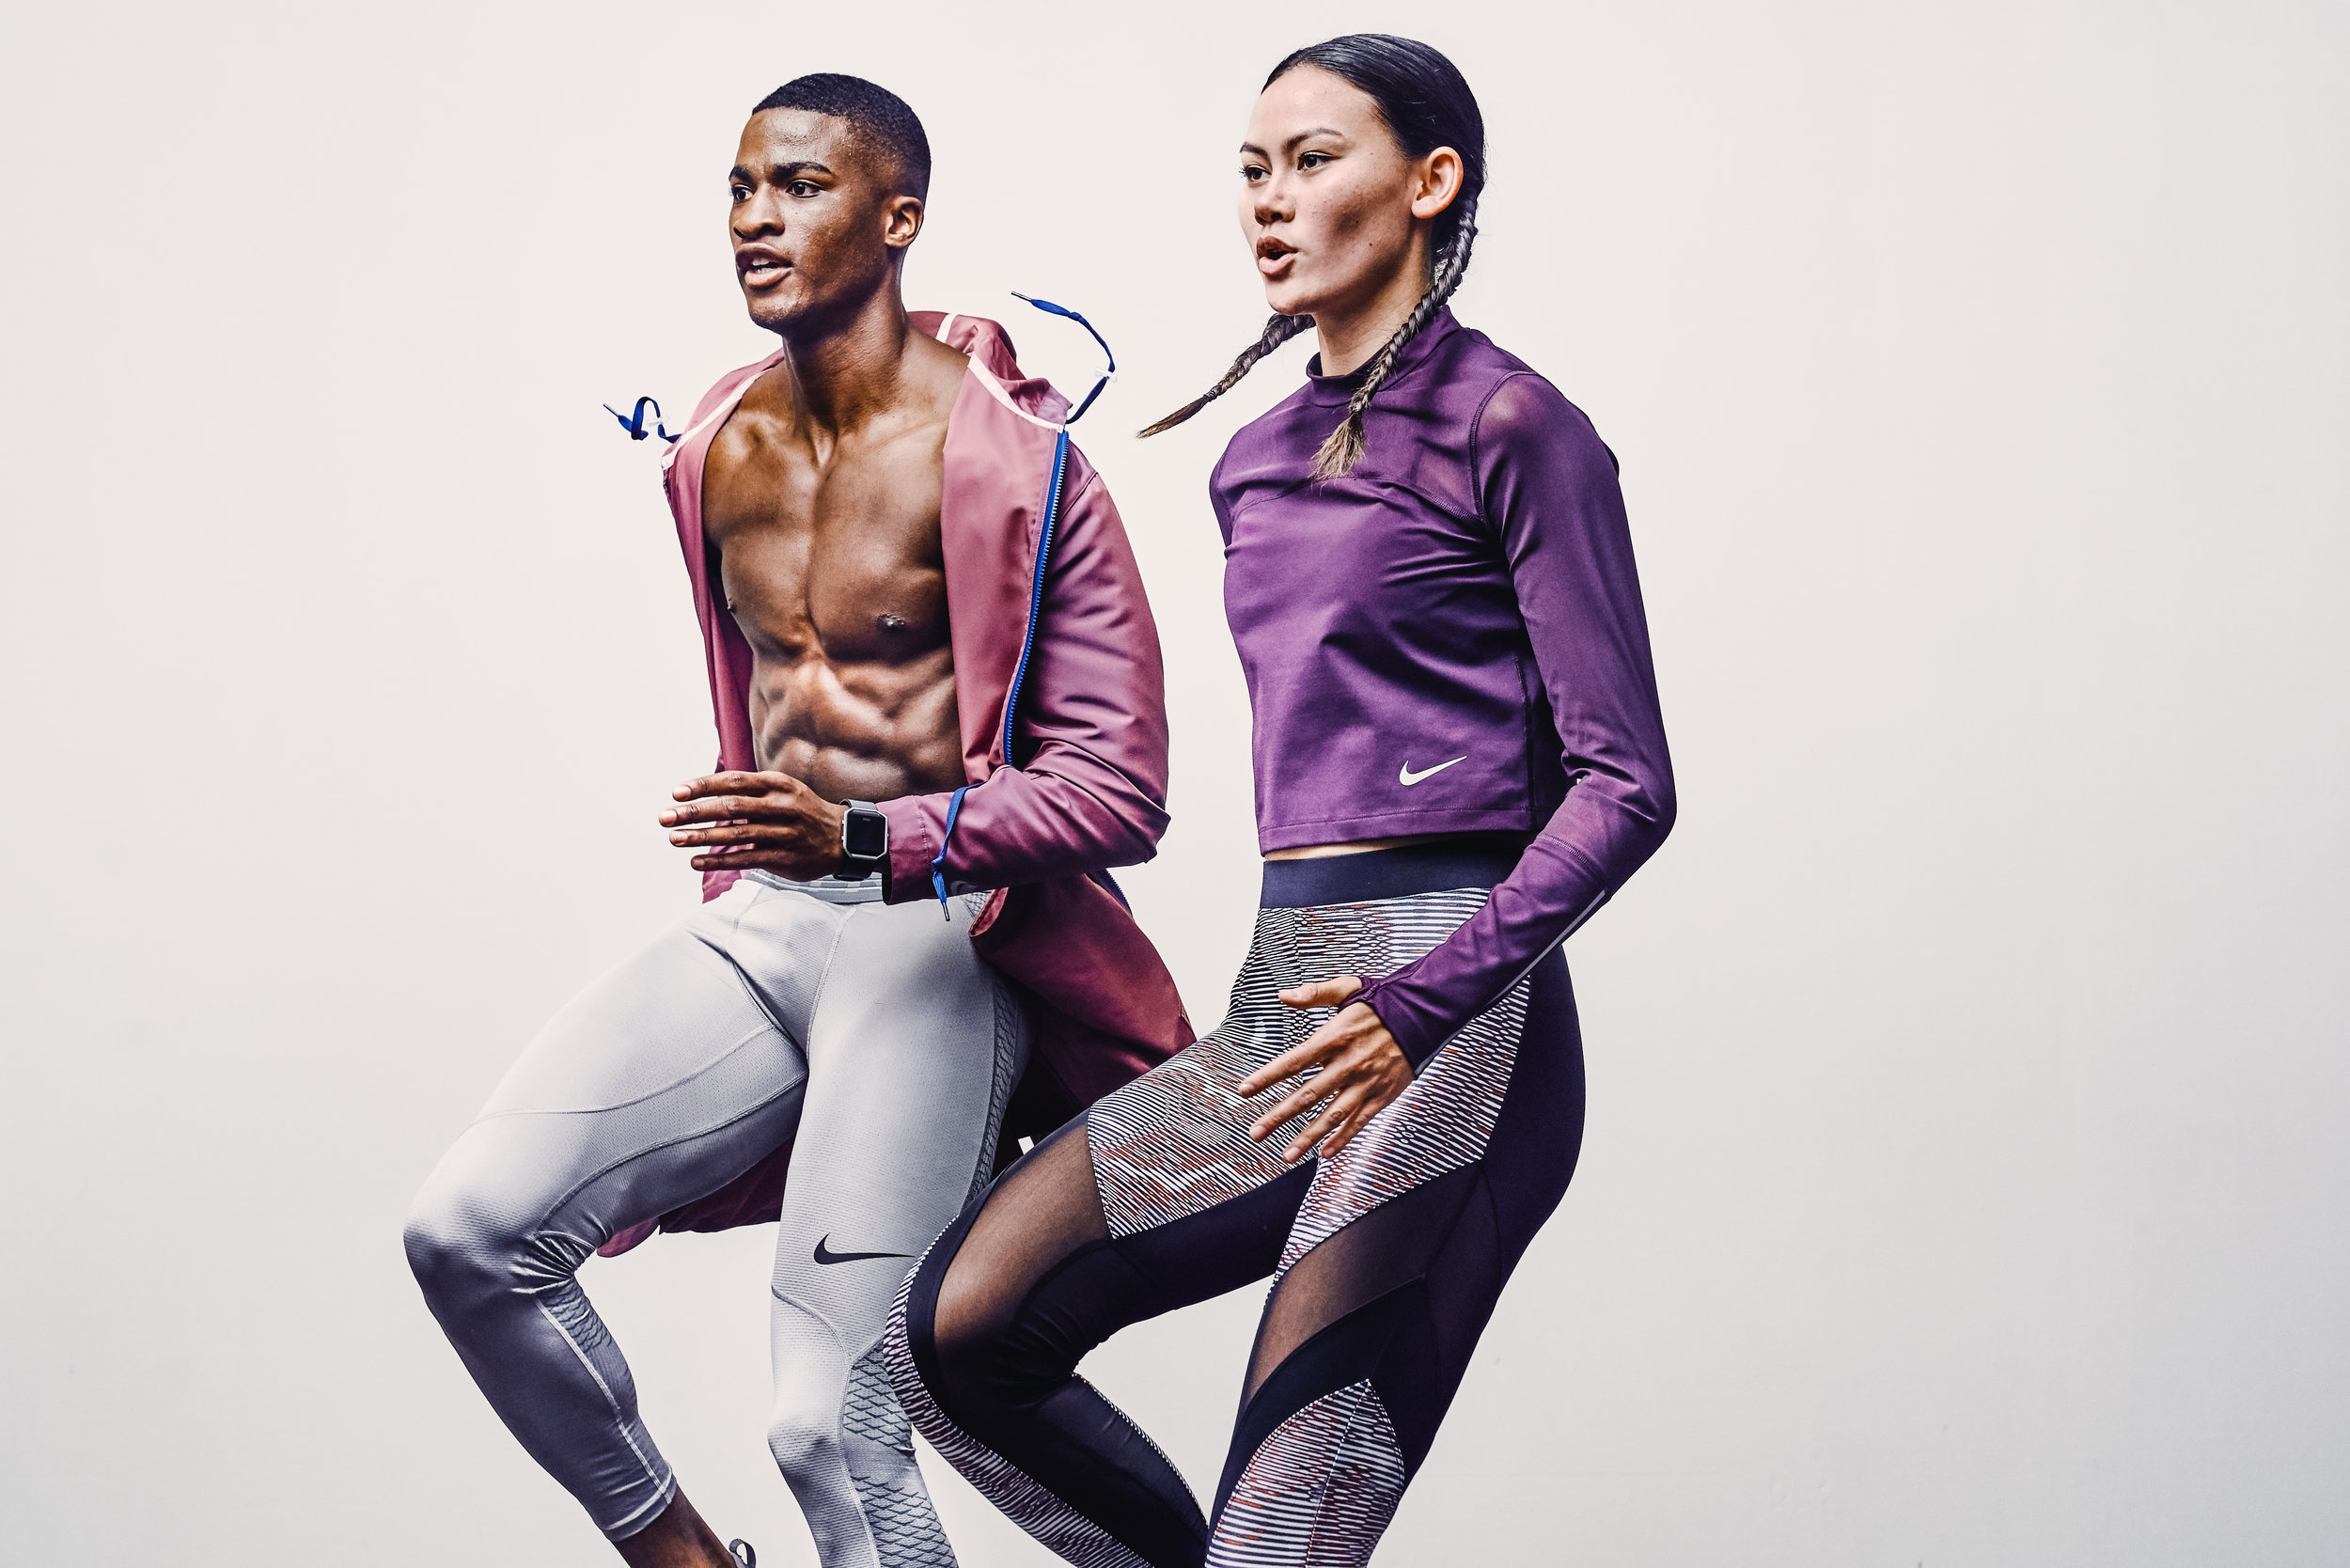 OBJKTV_MaxRes_Fitness_Nike Studio Shoot7761.jpg